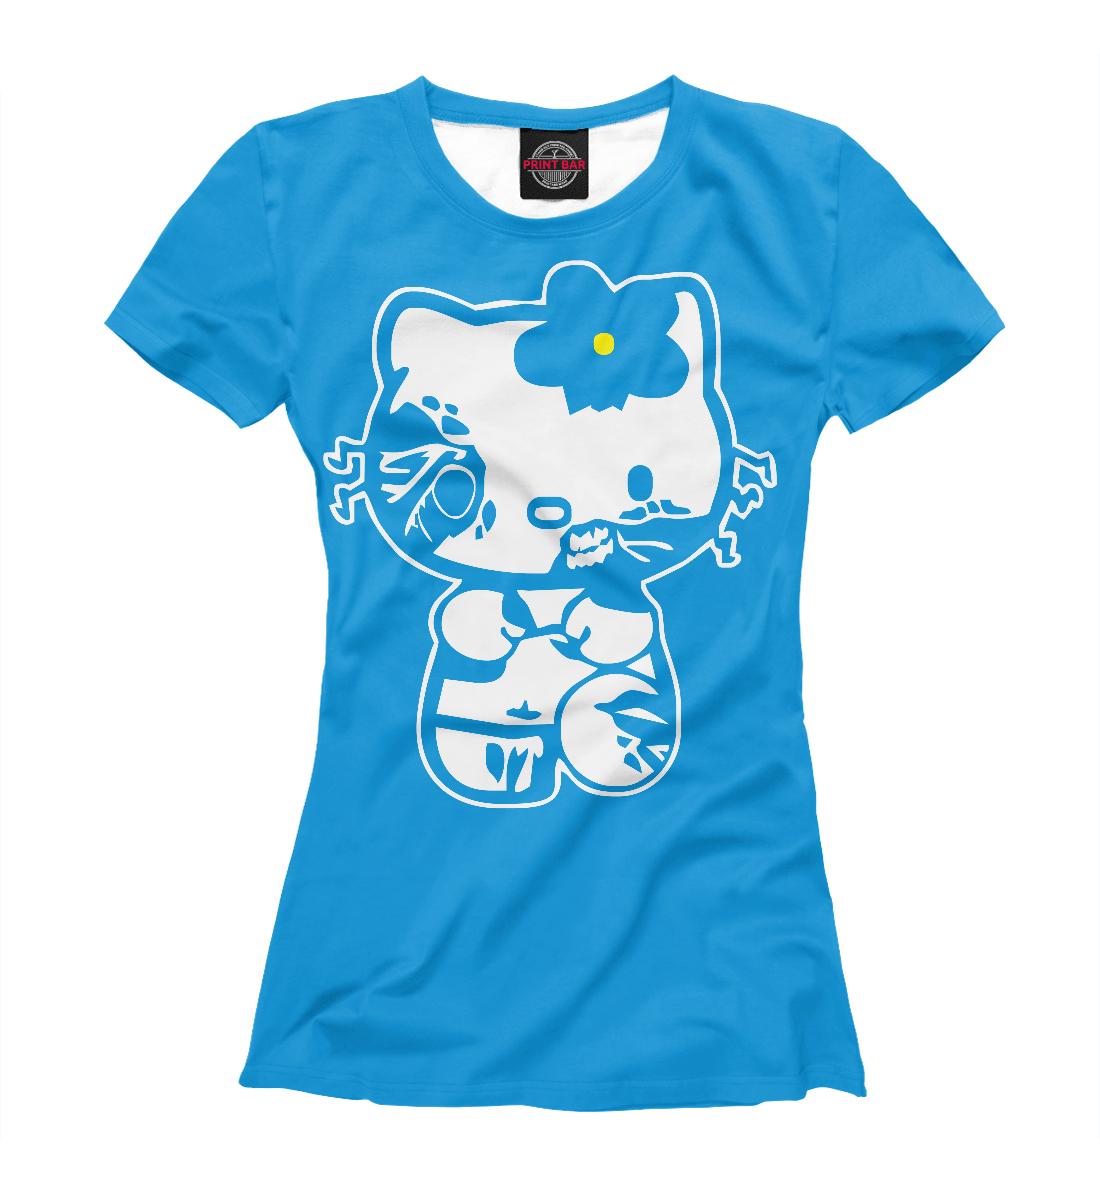 Купить Zombie Kitty, Printbar, Футболки, APD-986140-fut-1